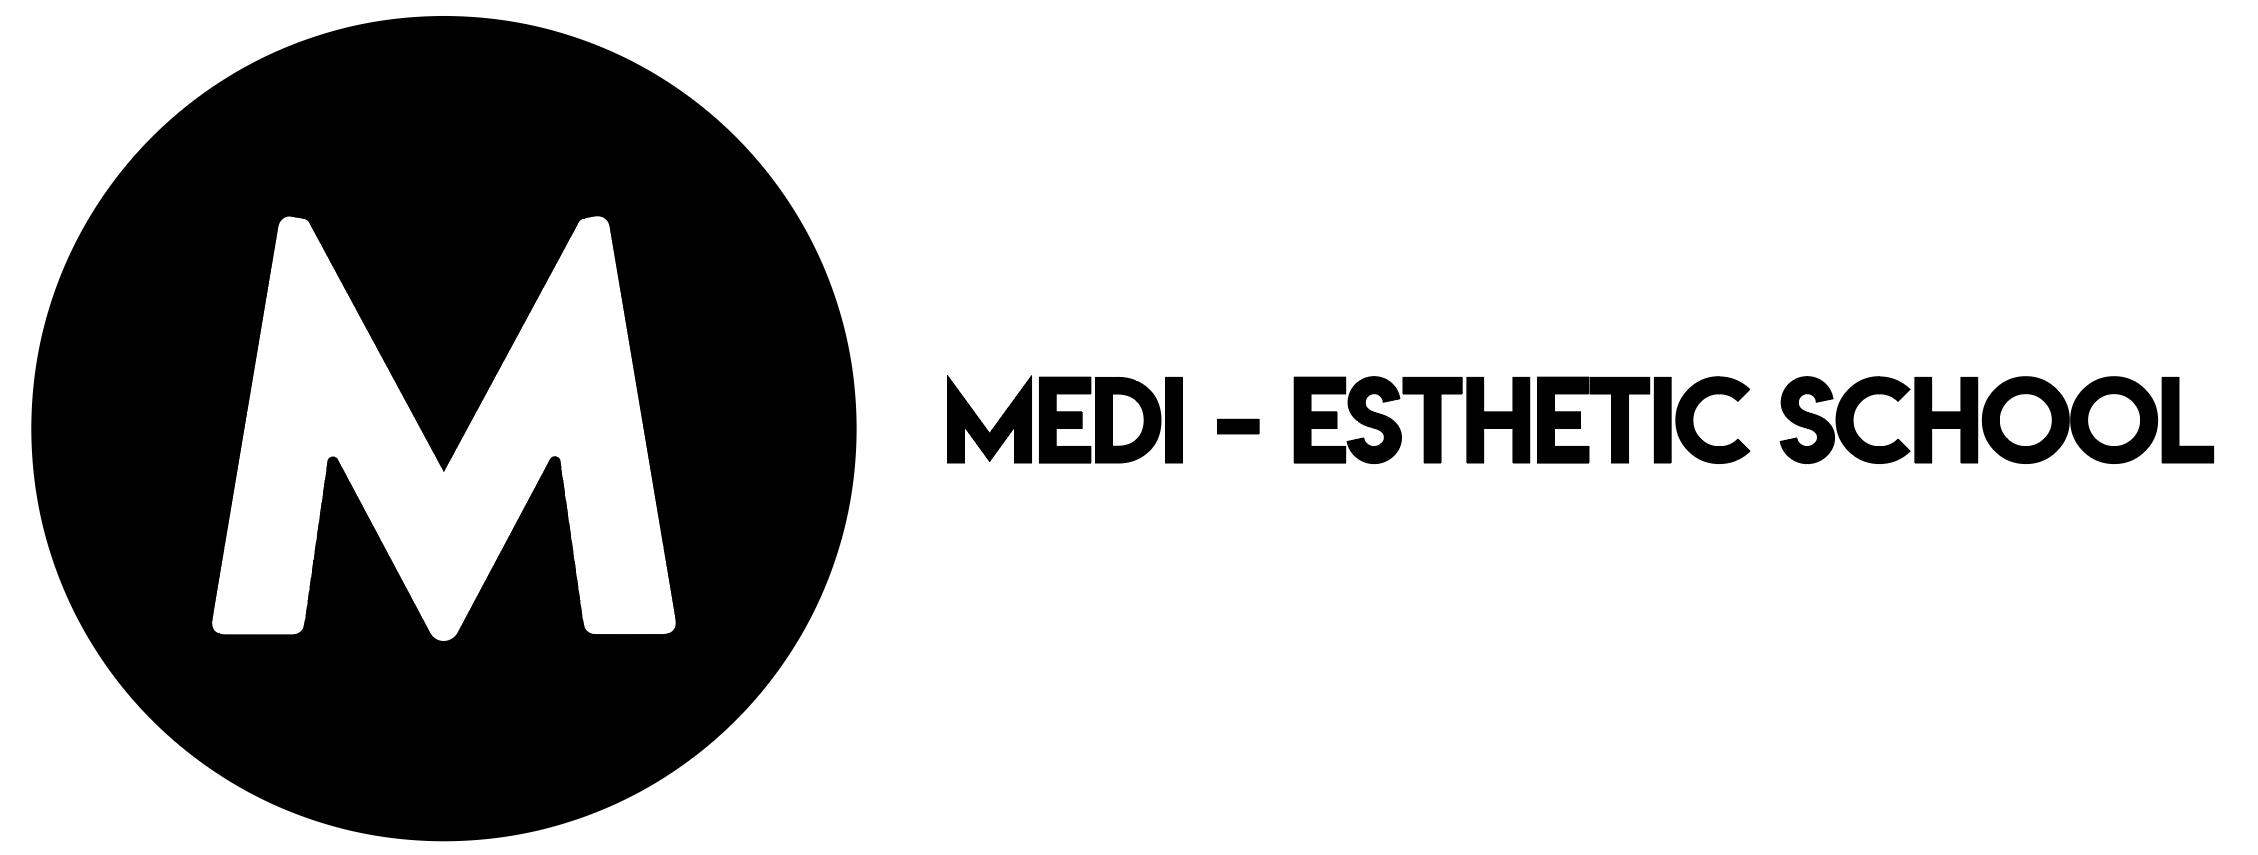 Medi Esthetic School